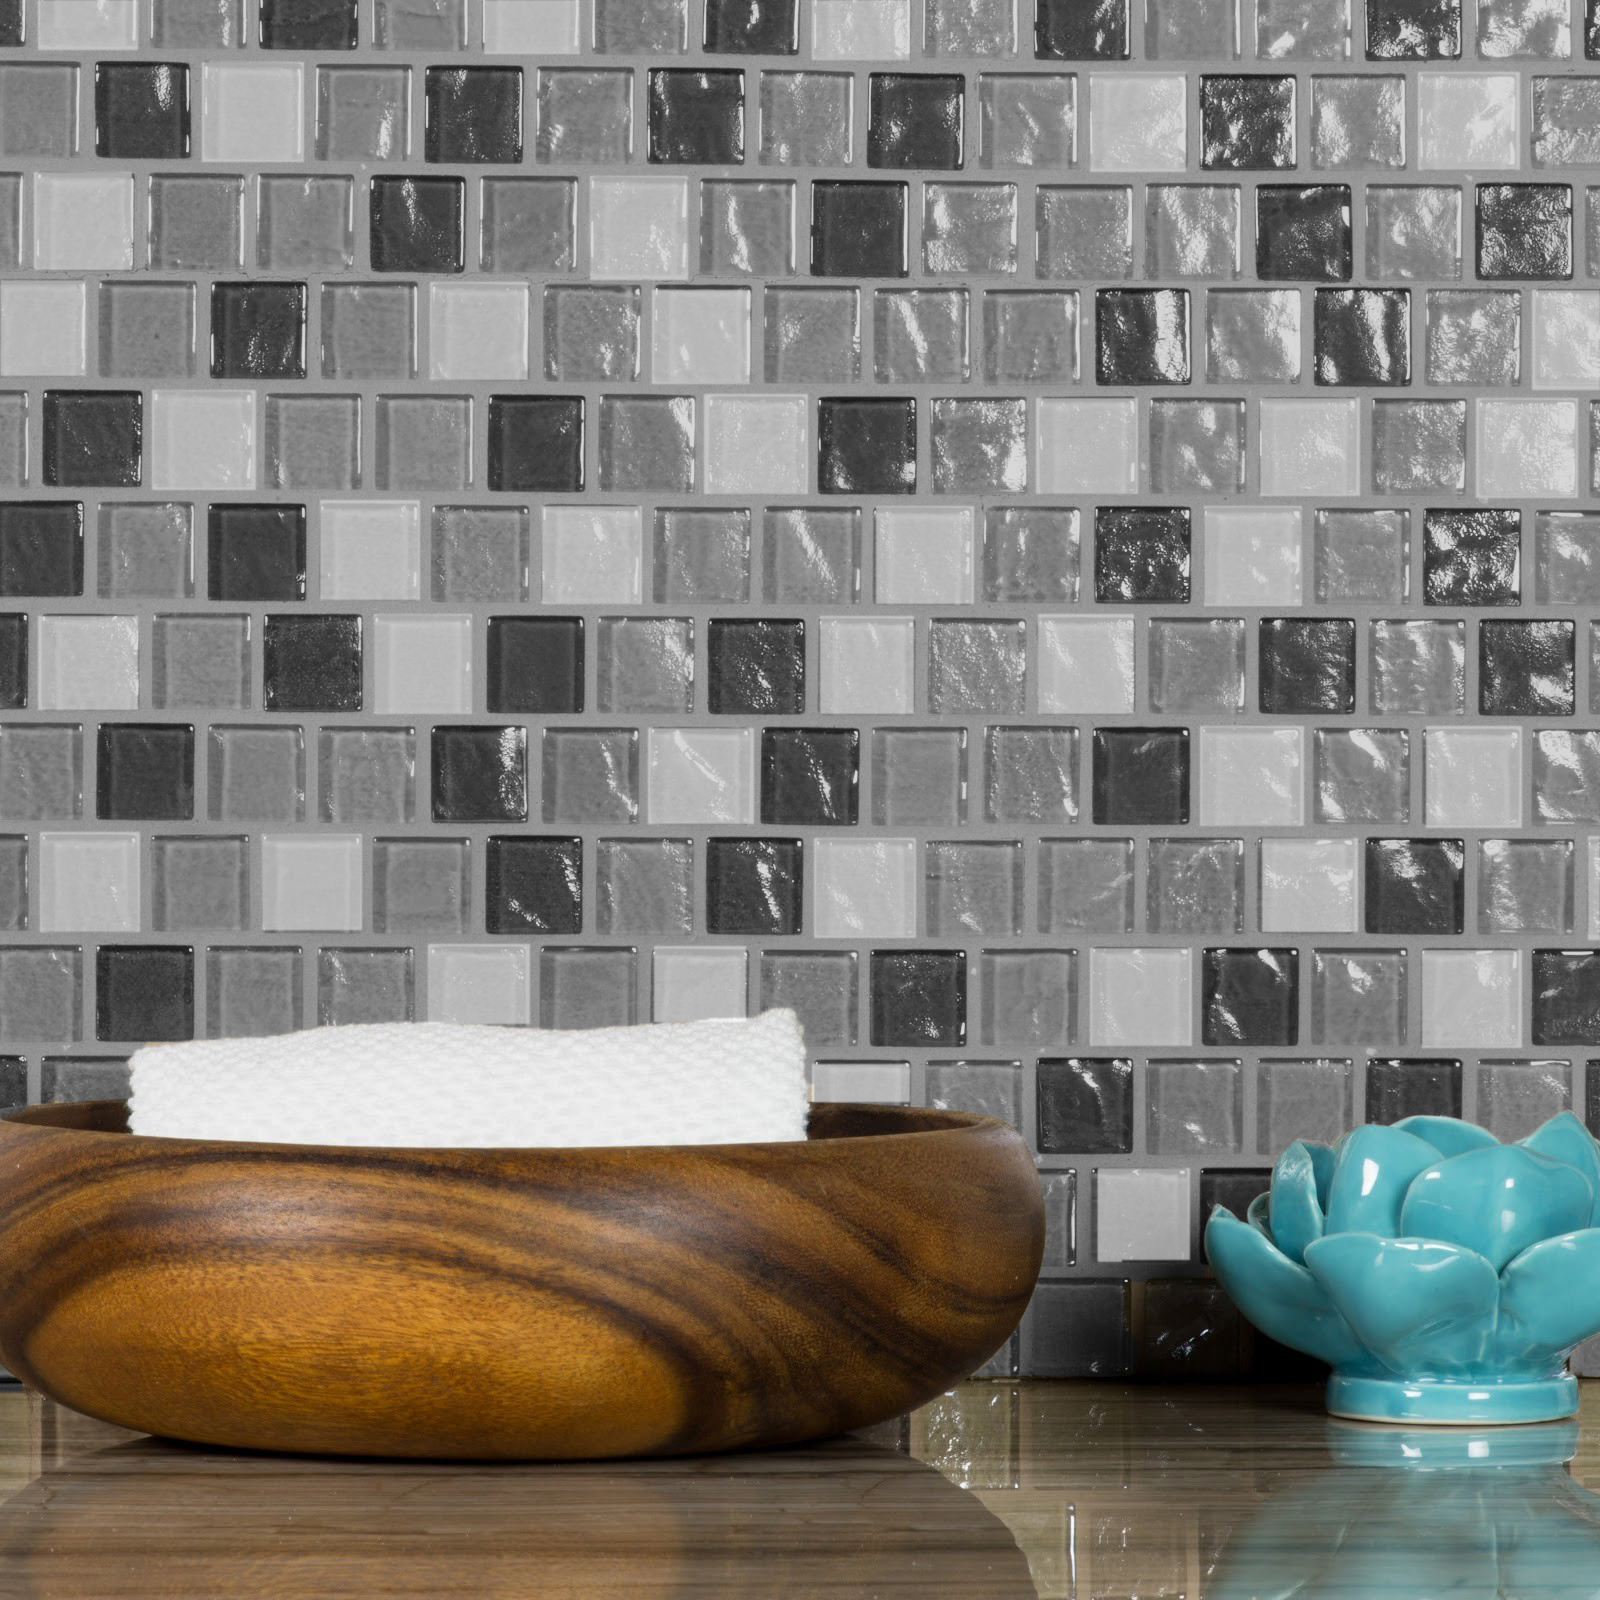 "Abolos- Geo 1"" x 1"" Glass Mosaic Backsplash Tile in Gray (4.9sqft / 5pc Box)"